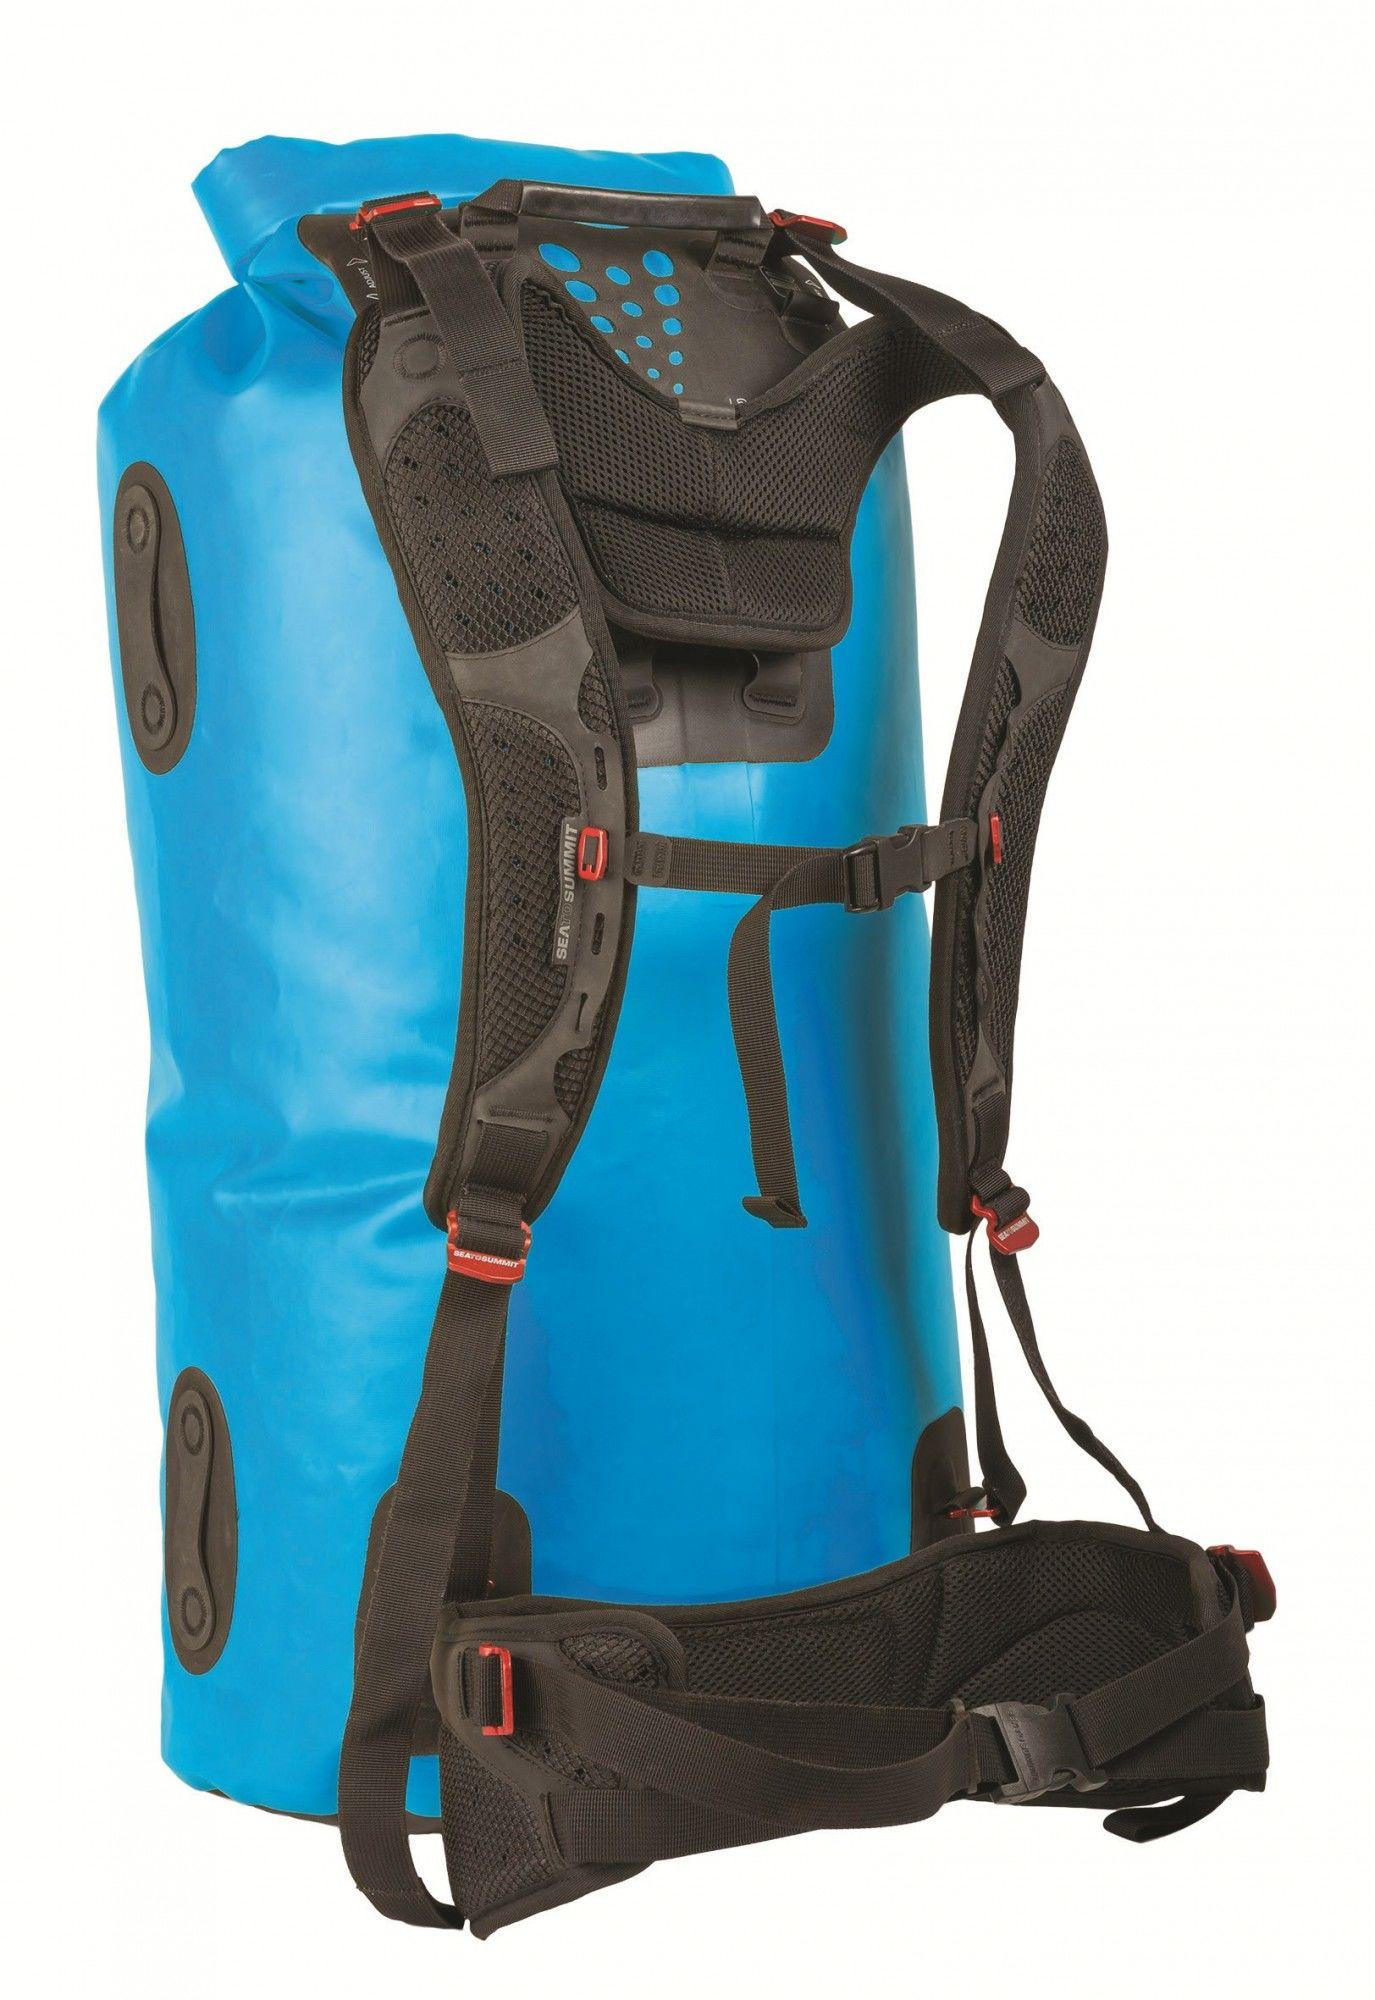 Sea to Summit Hydraulic Drypack 90L Blau, Taschen, 90l